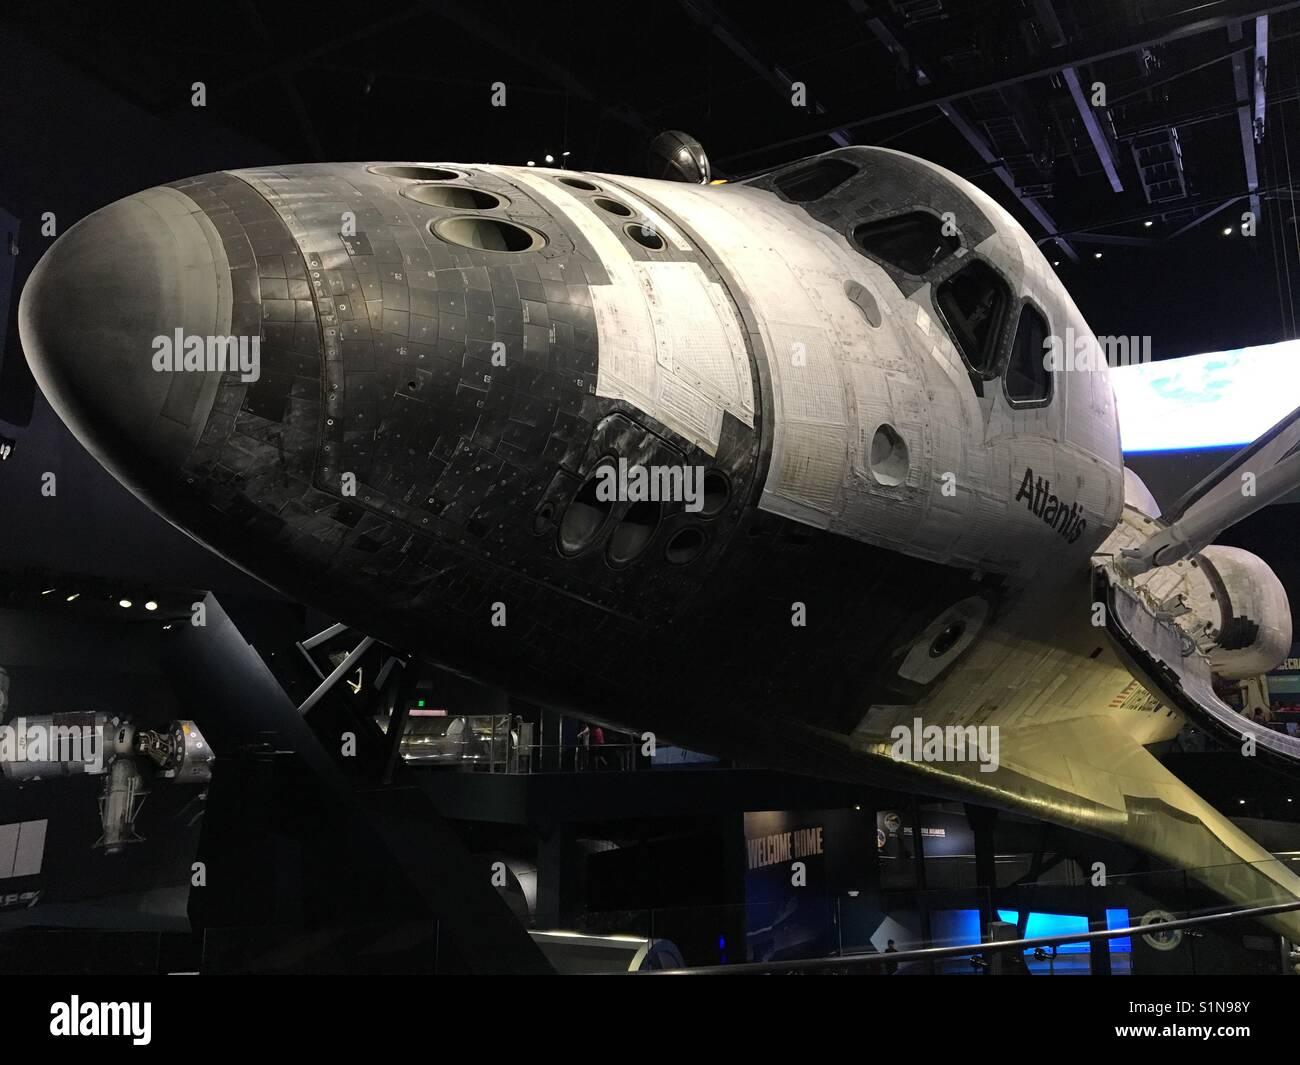 space shuttle atlantis purpose - photo #2